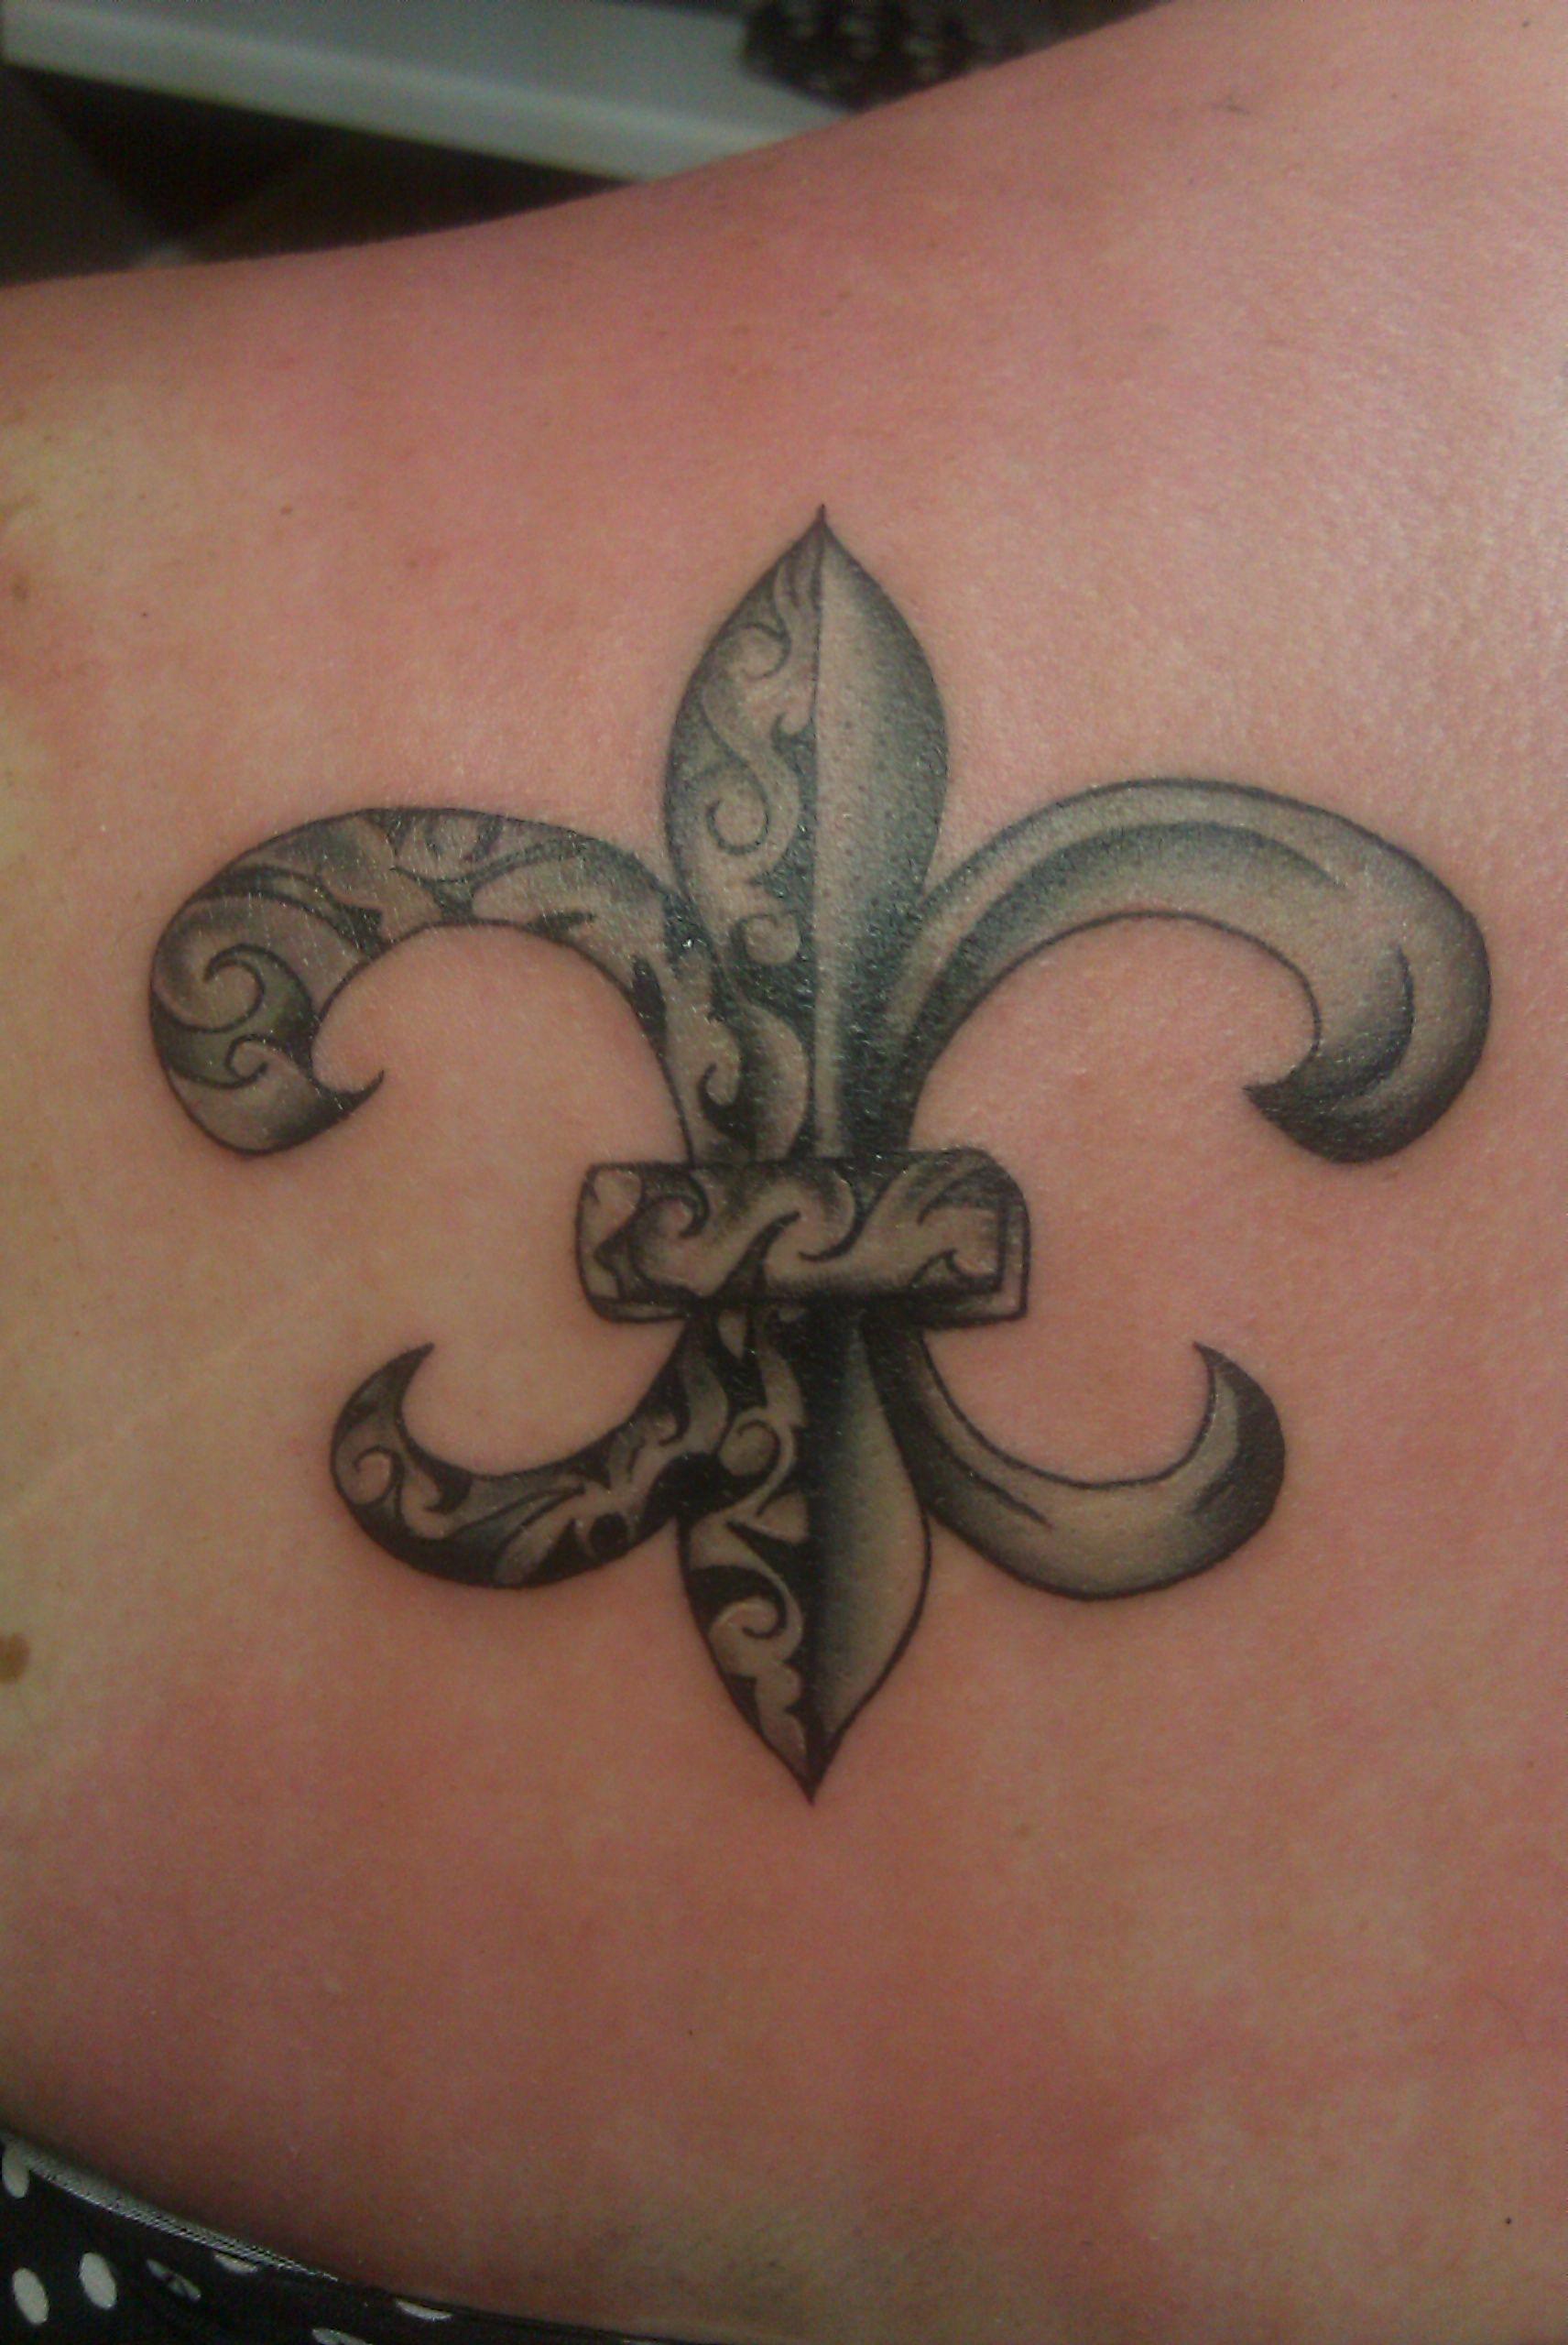 I totally want this tattooed on me tattoos custom